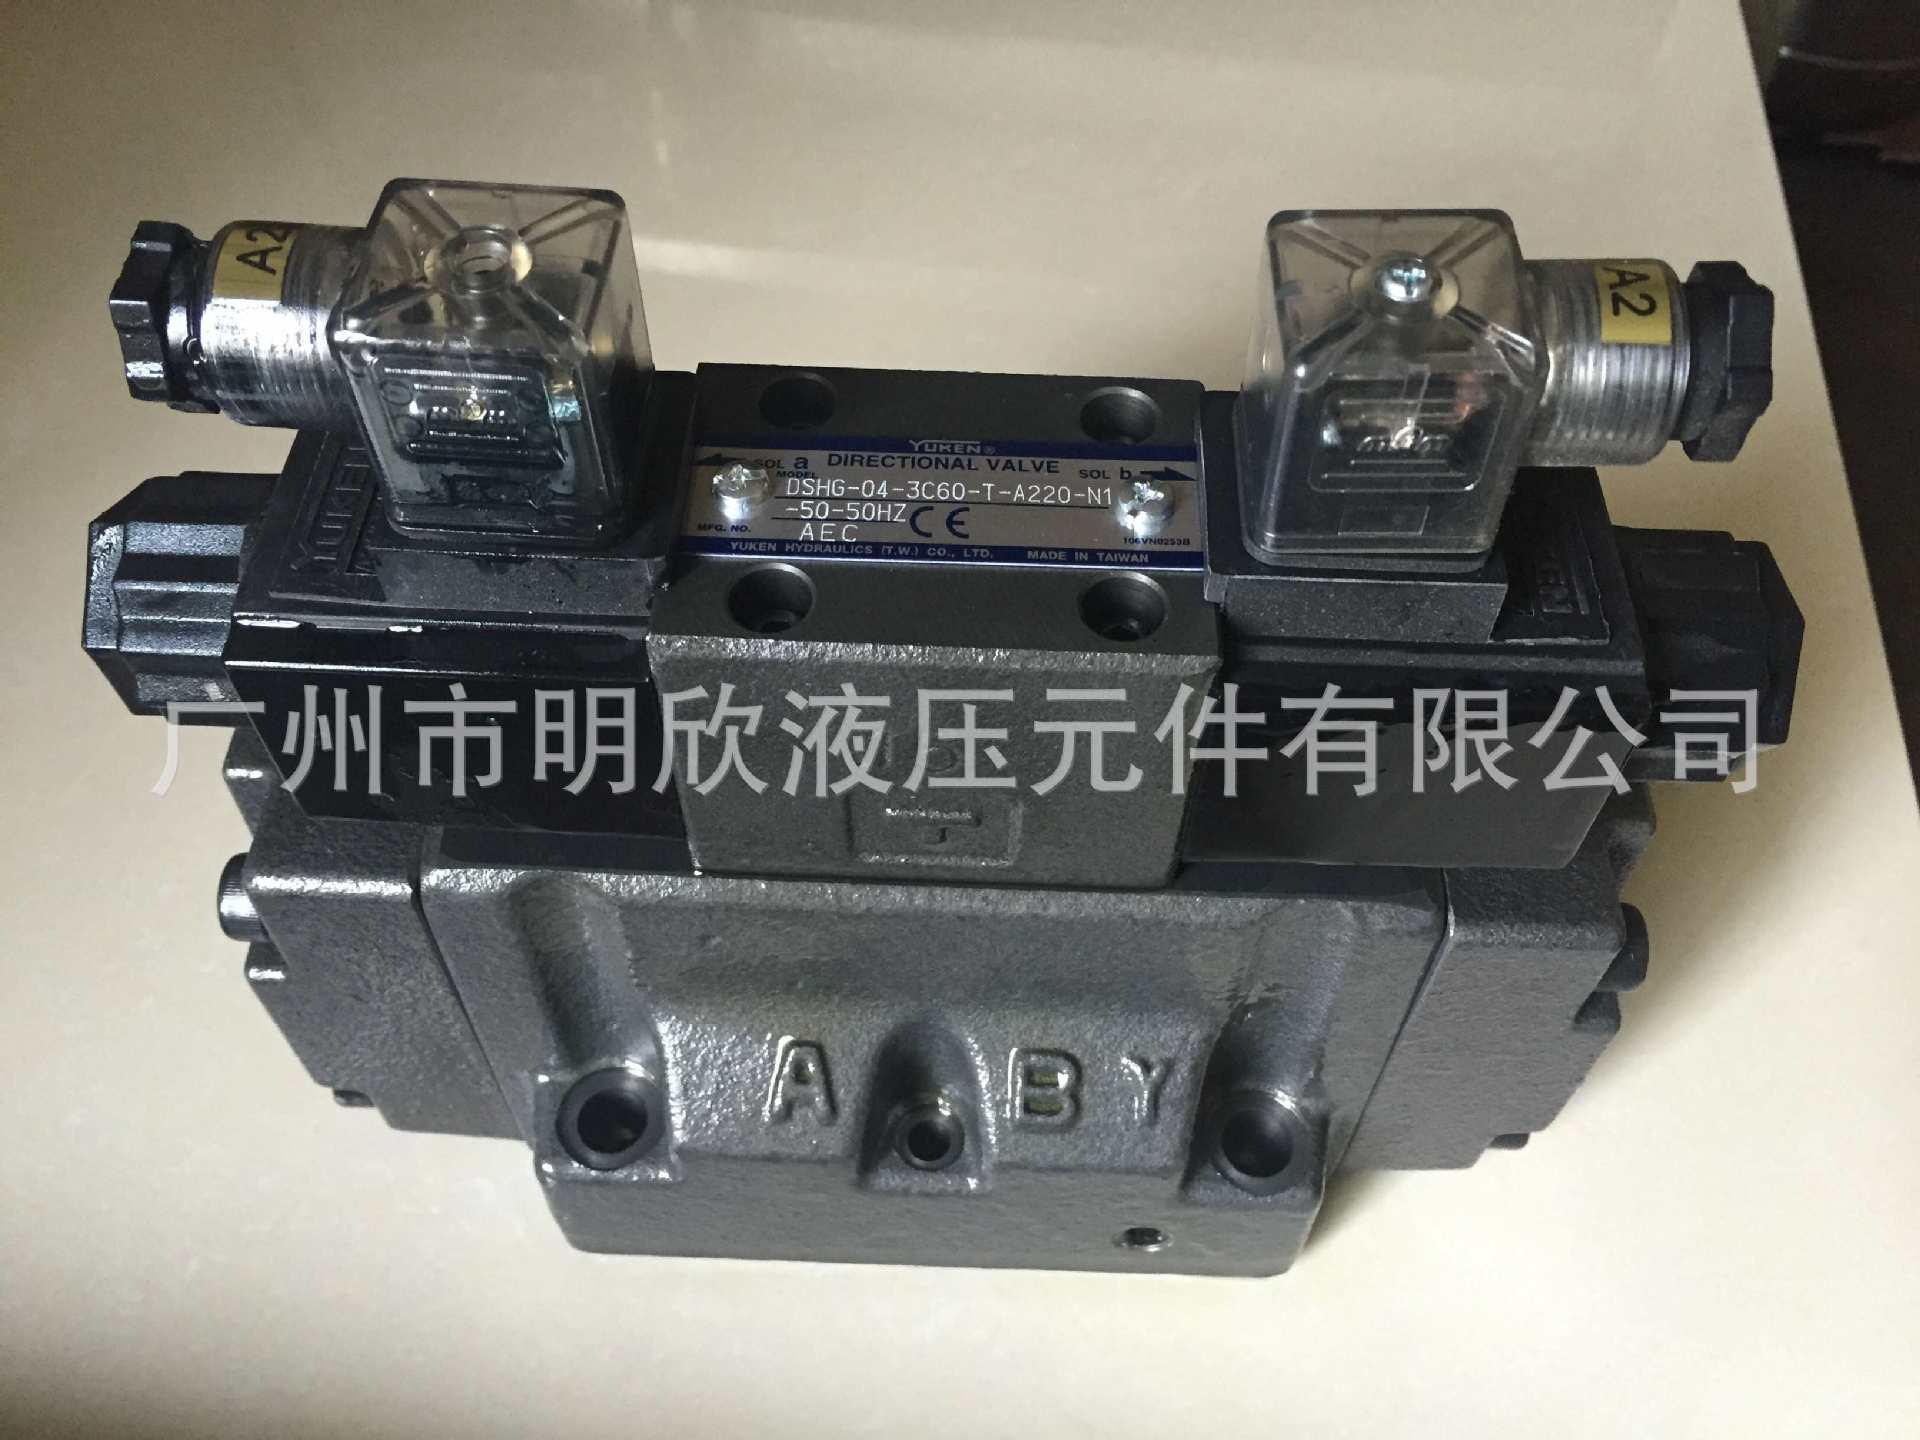 edfhg-04-140-3c40-xy-31t台湾油研正品yuken电液比例换向调速阀图片